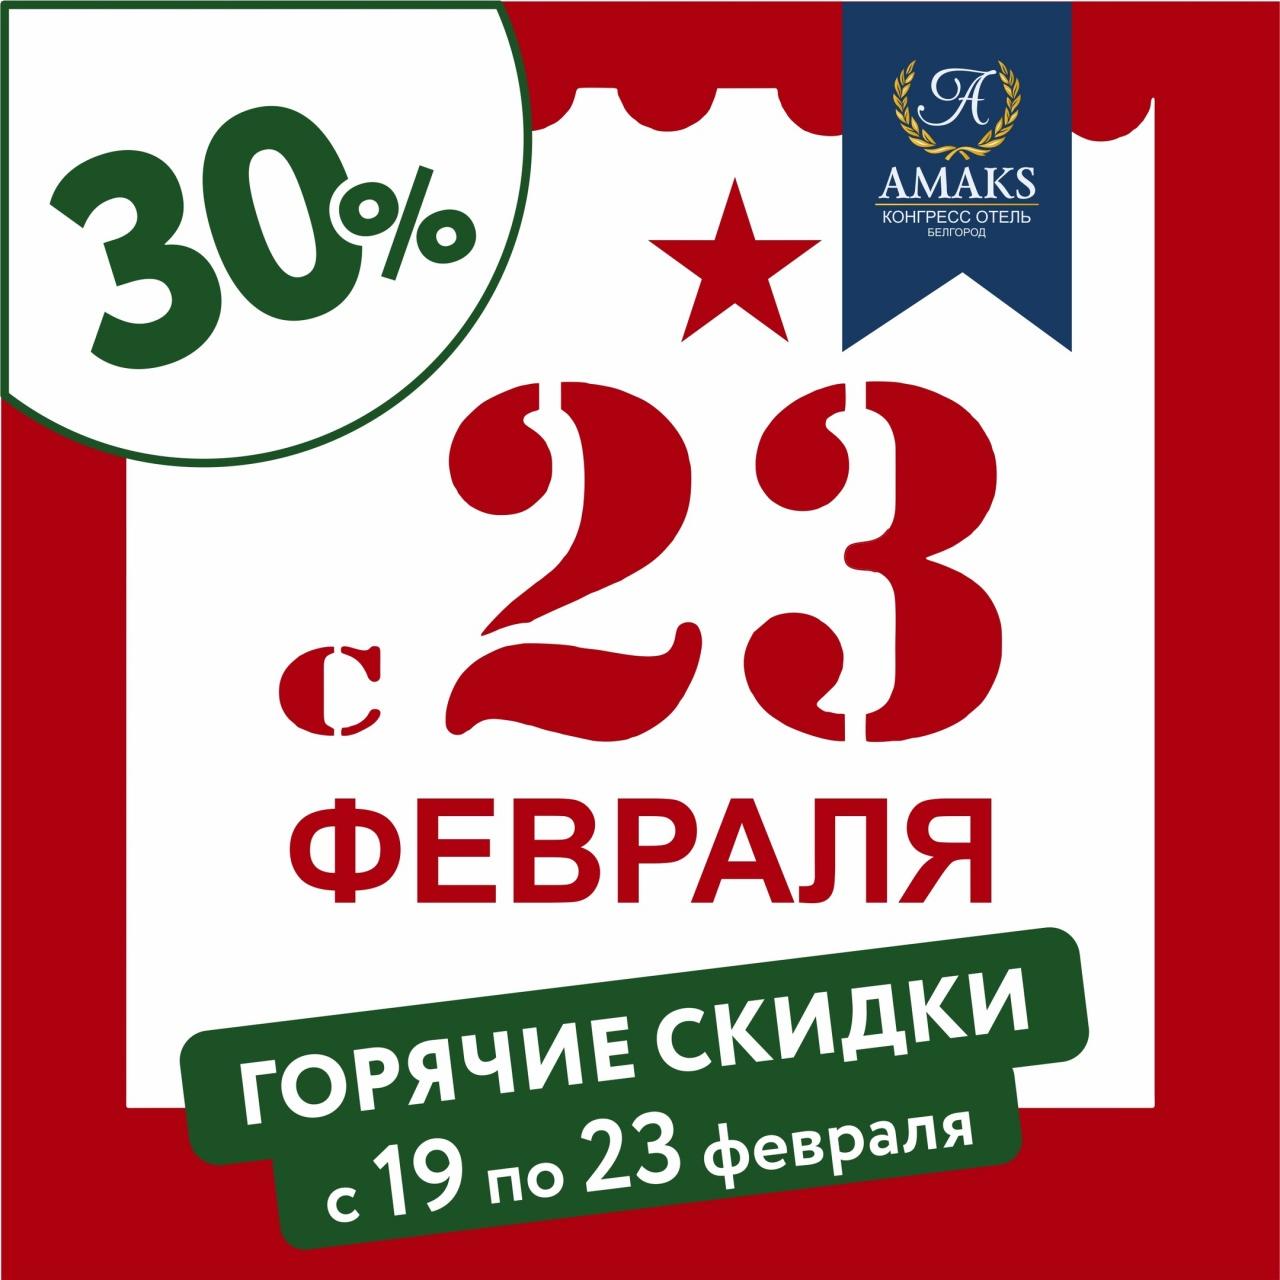 Горячие скидки 30% на проживание в отеле ко Дню защитника Отечества!